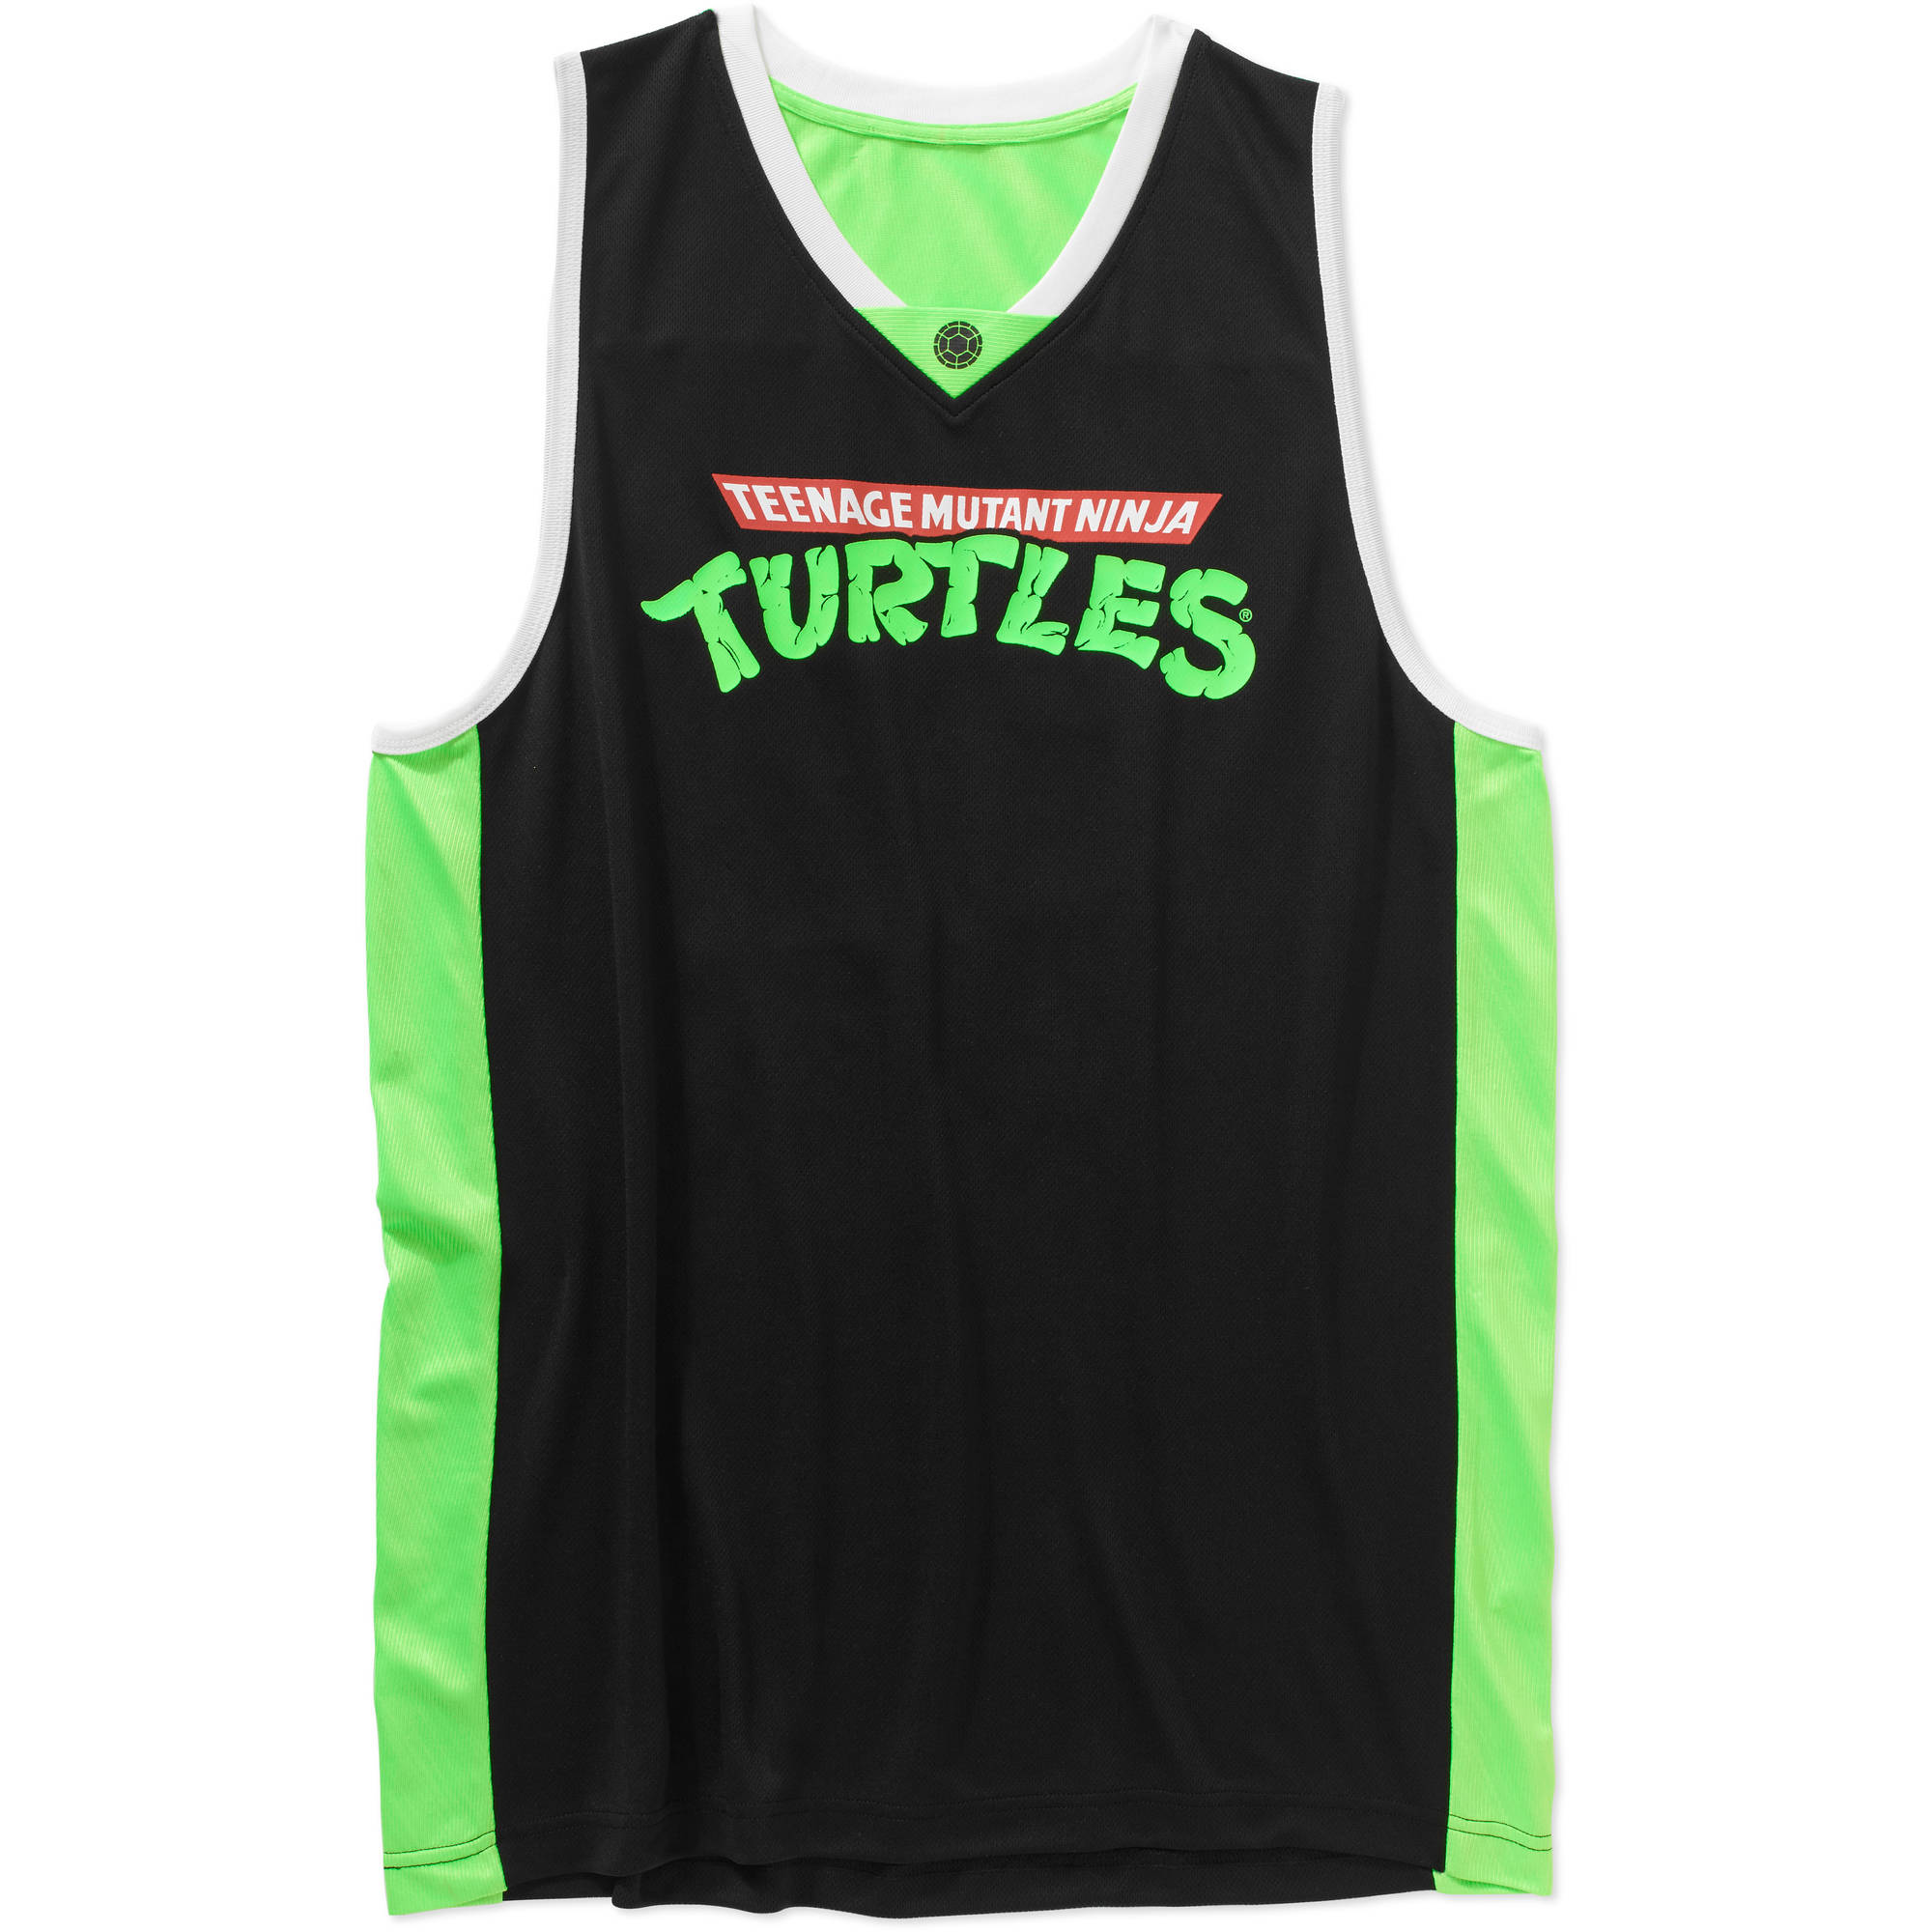 Teenage Mutant Ninja Turtles Men's Graphic Licensed Basketball Jersey